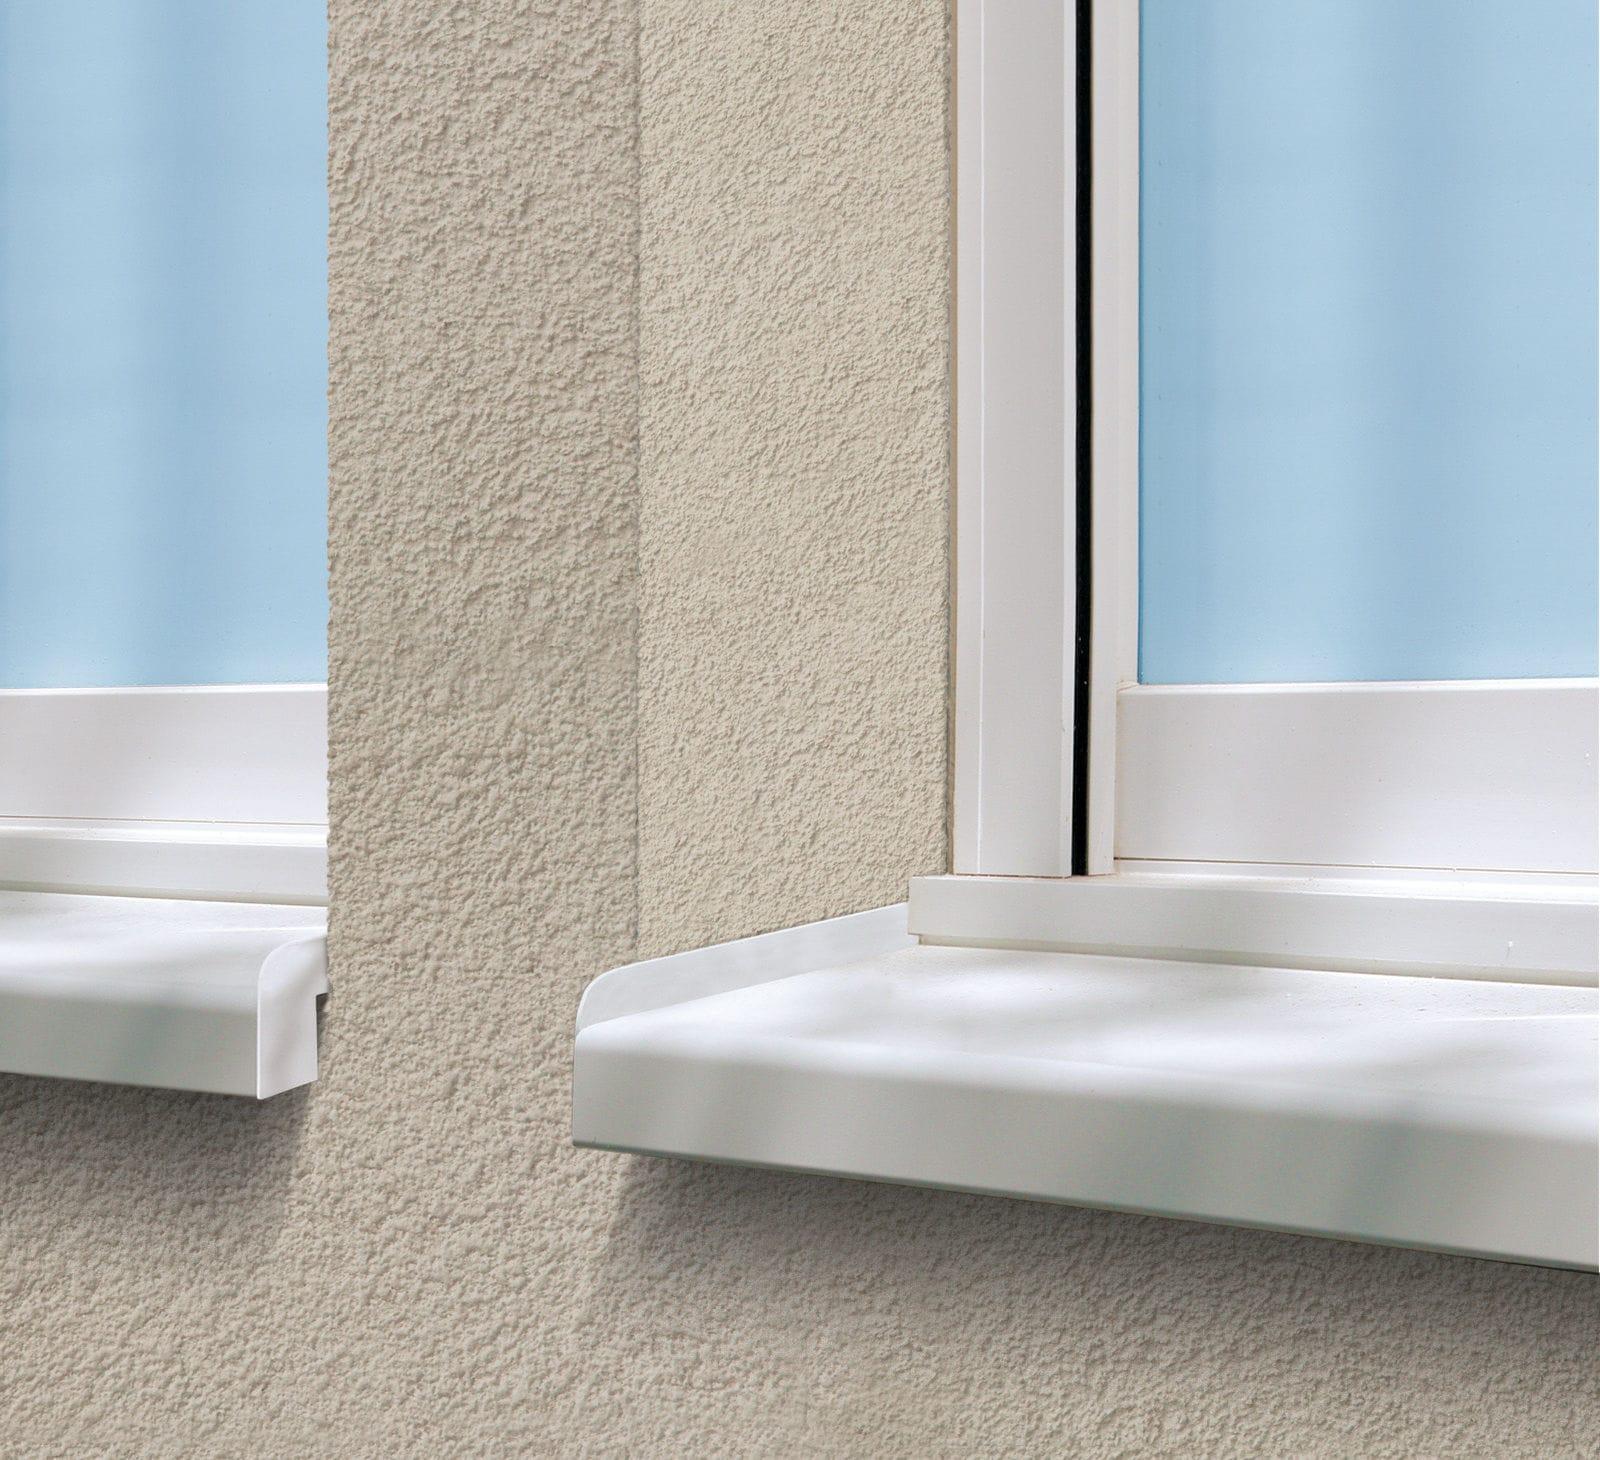 Aluminium-Fensterbank / zur Außenaufstellung - PROTEGENET® - dani alu